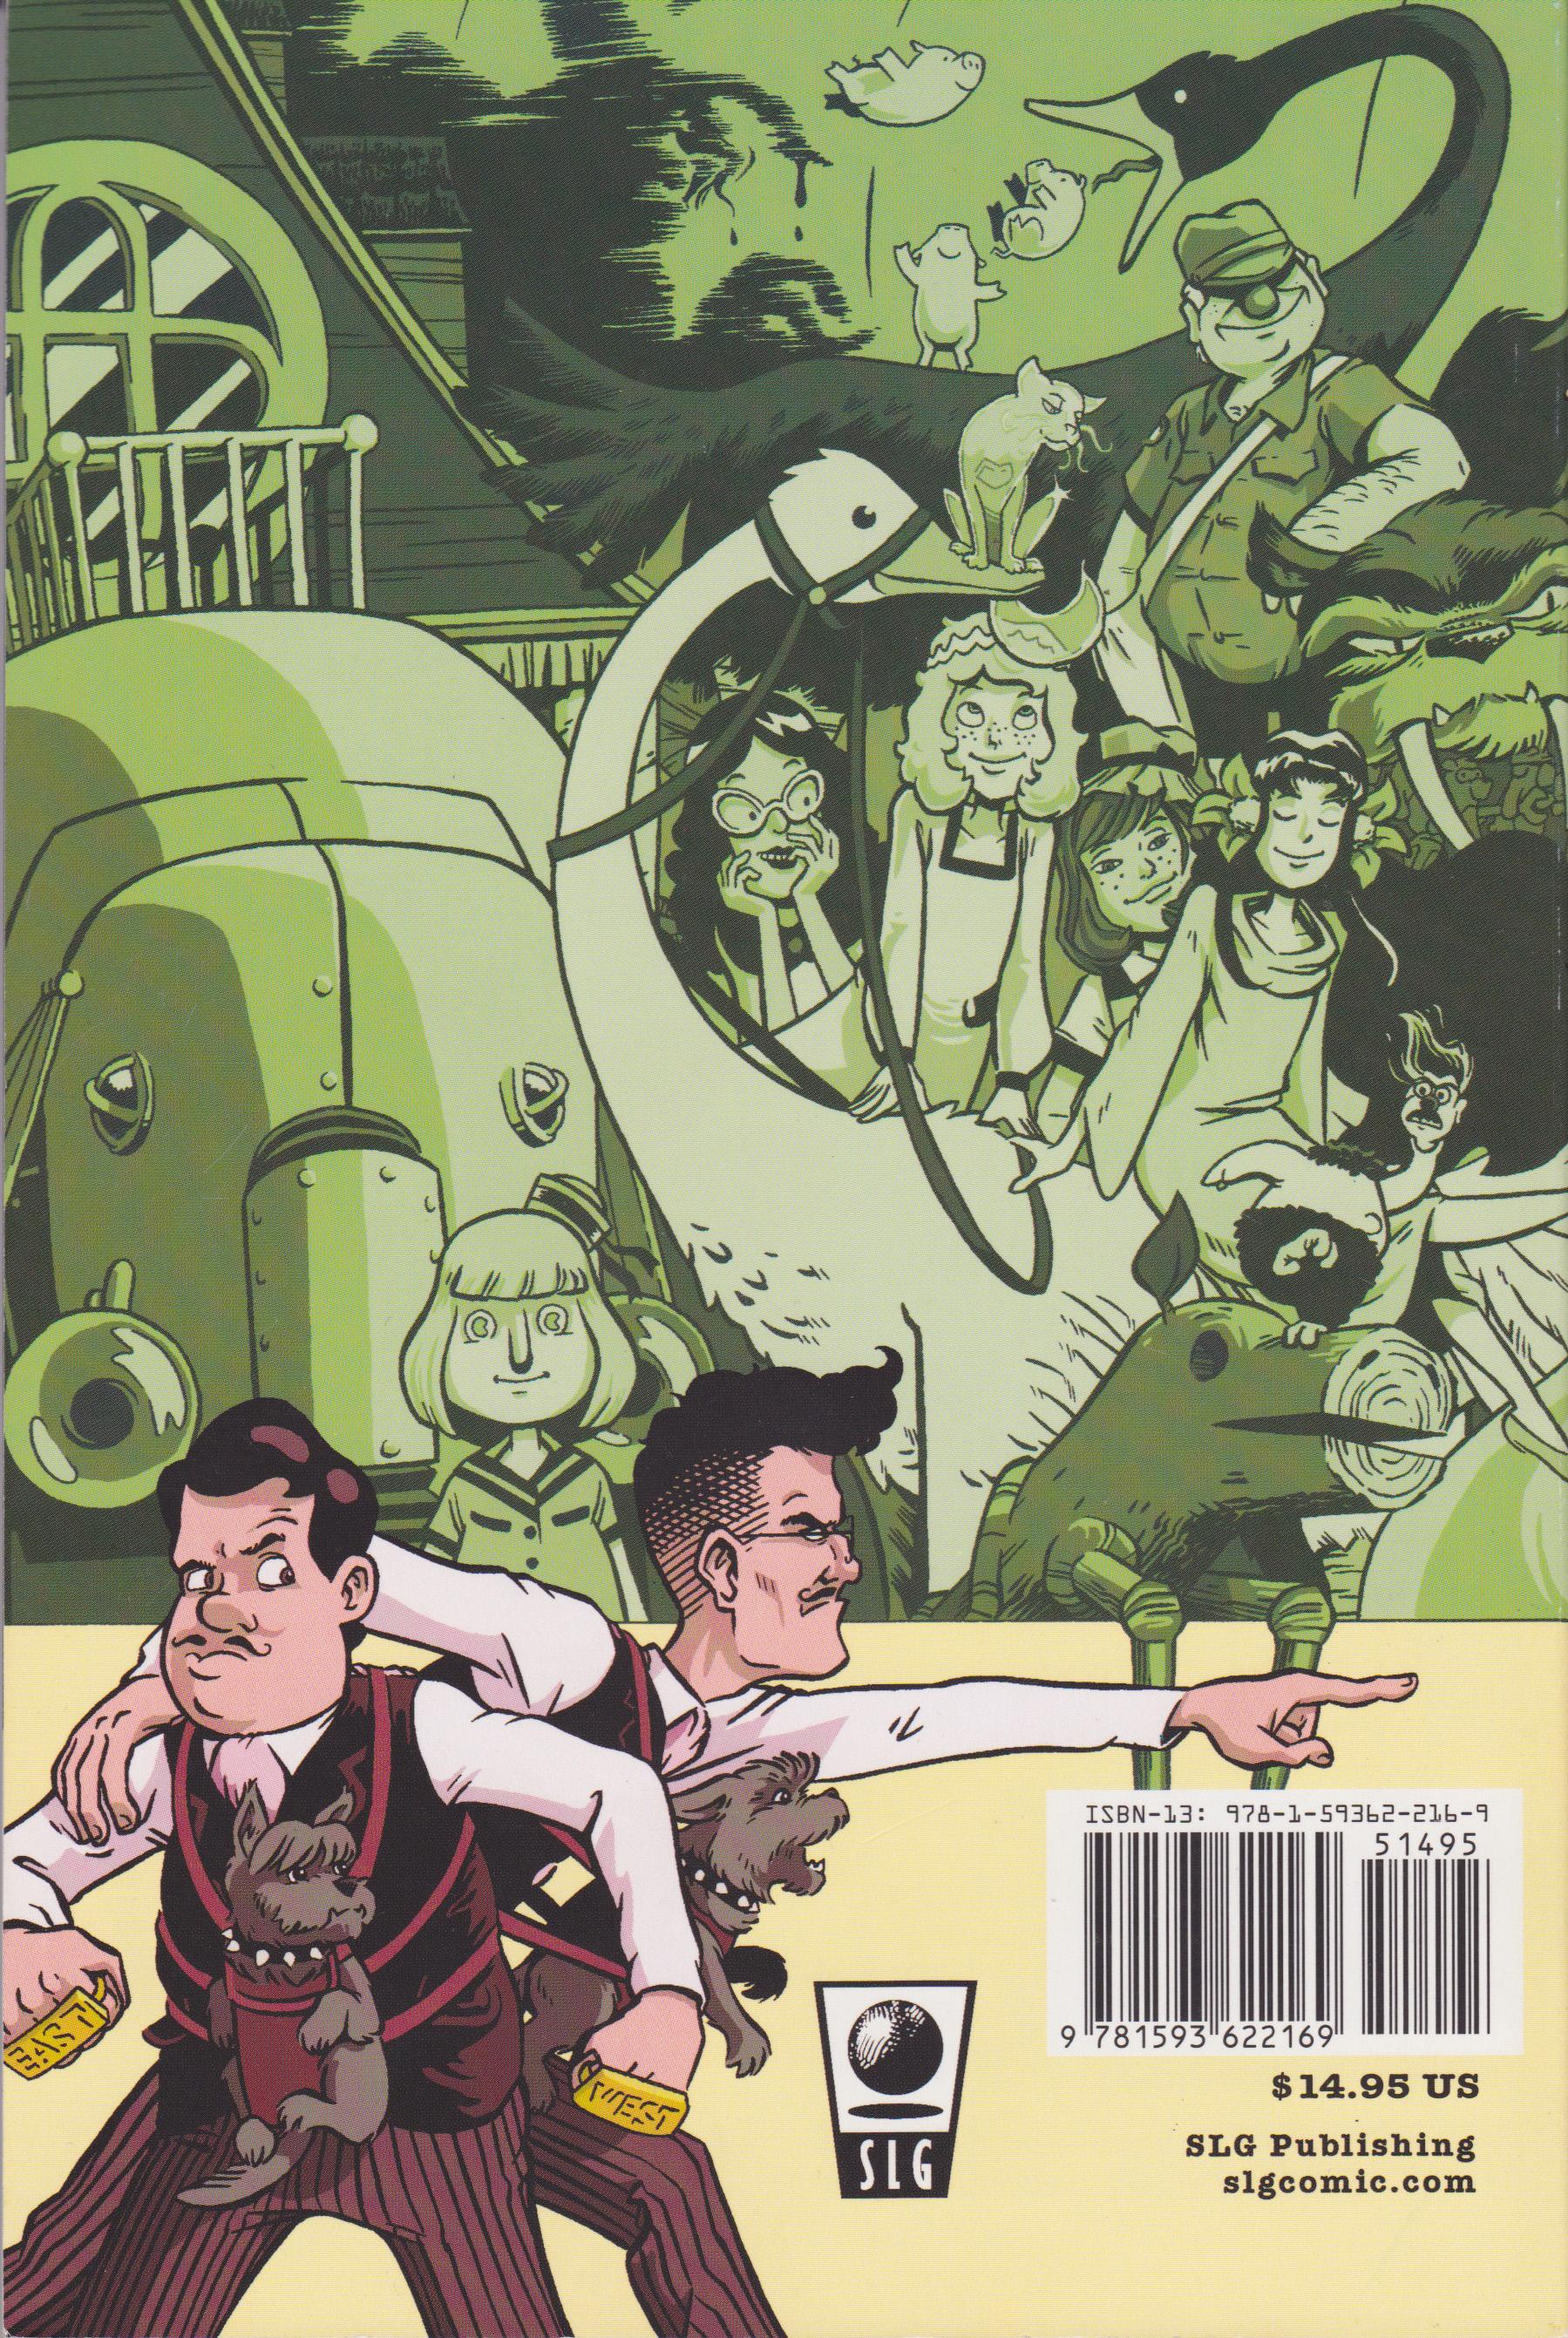 Royal Historian of Oz (trade collection back cover)